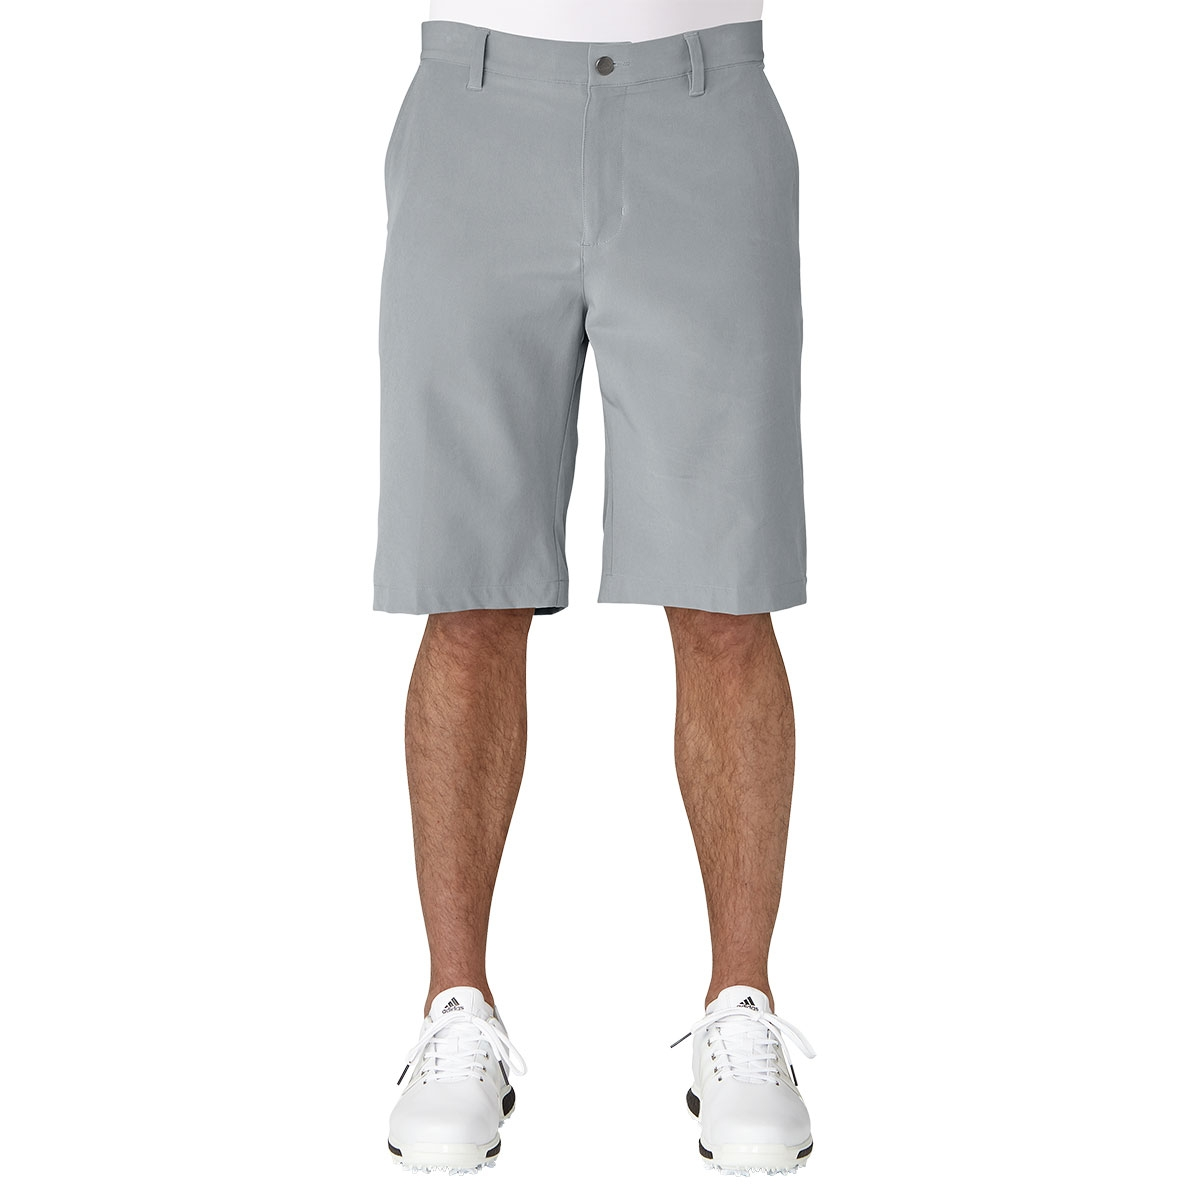 Adidas Mens 2018 Ultimate 365 Grey Short